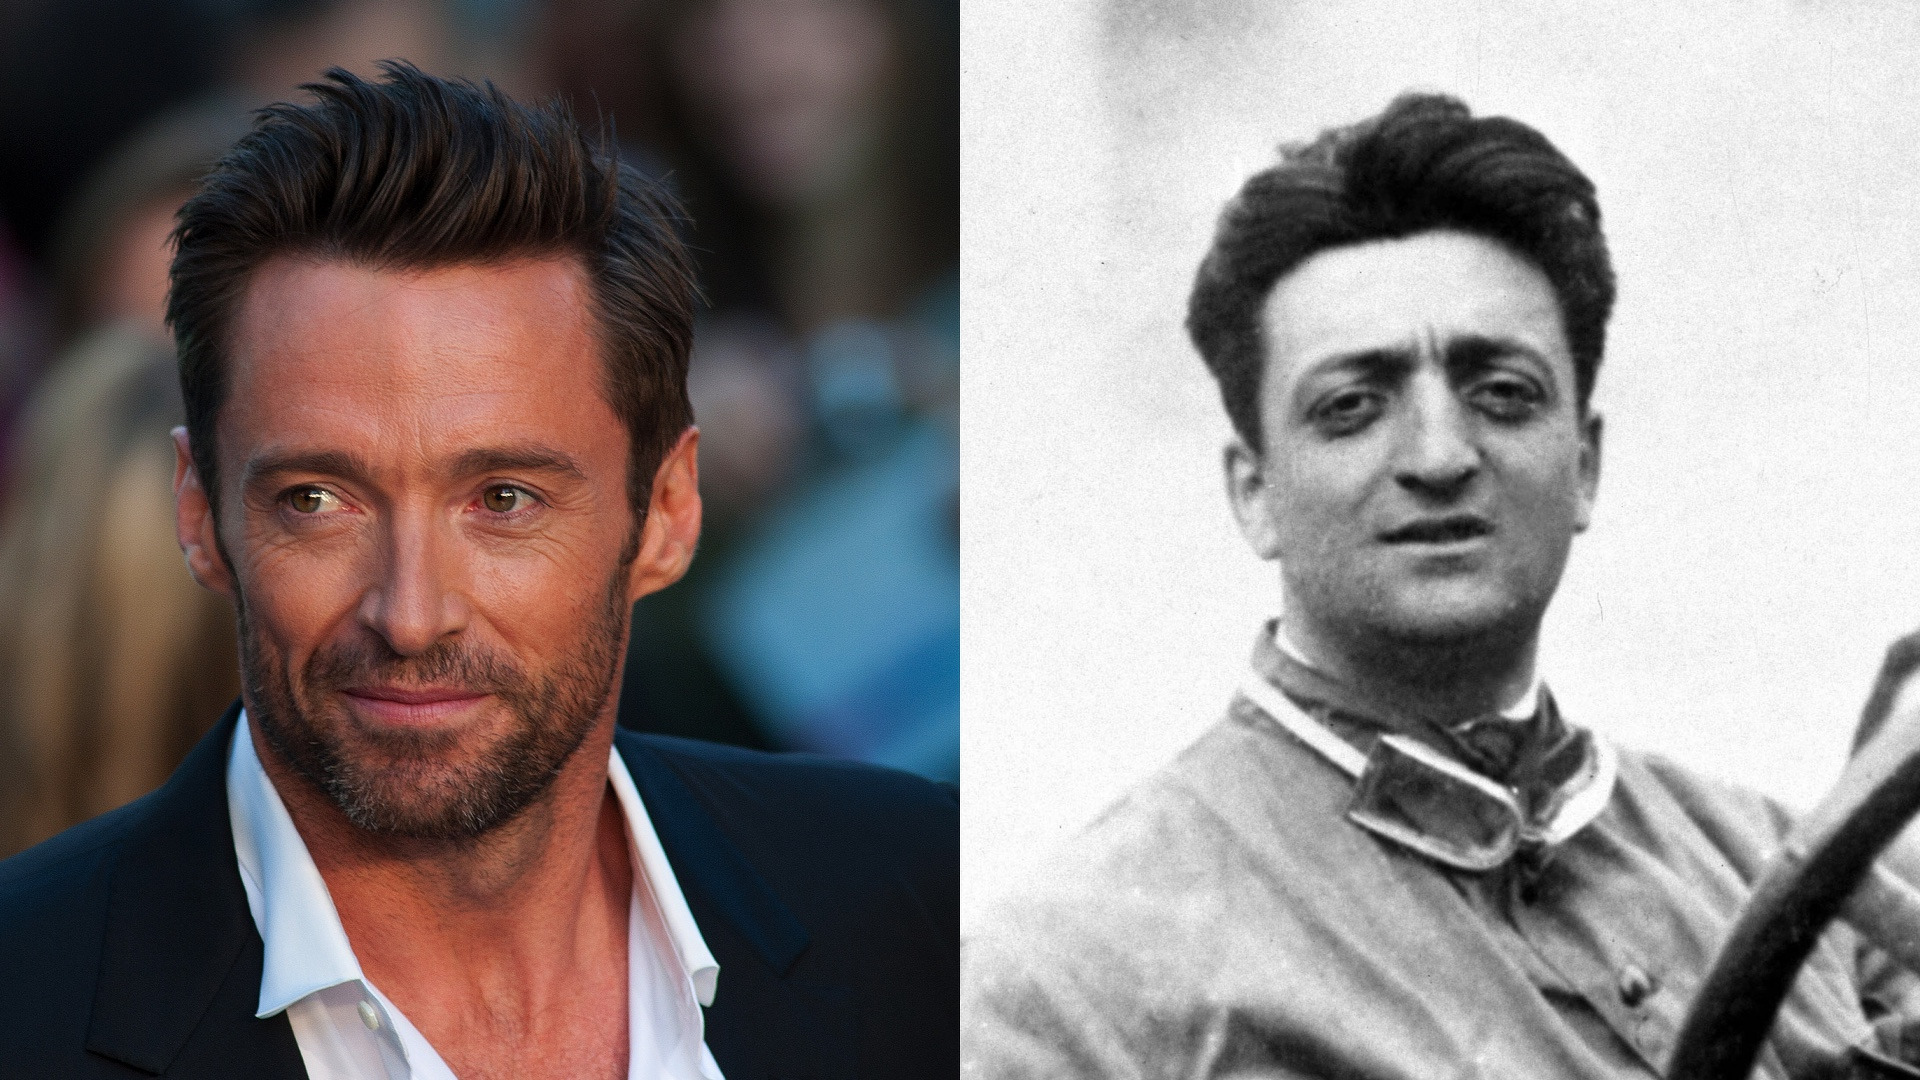 Will Hugh Jackman Make A Good Enzo Ferrari